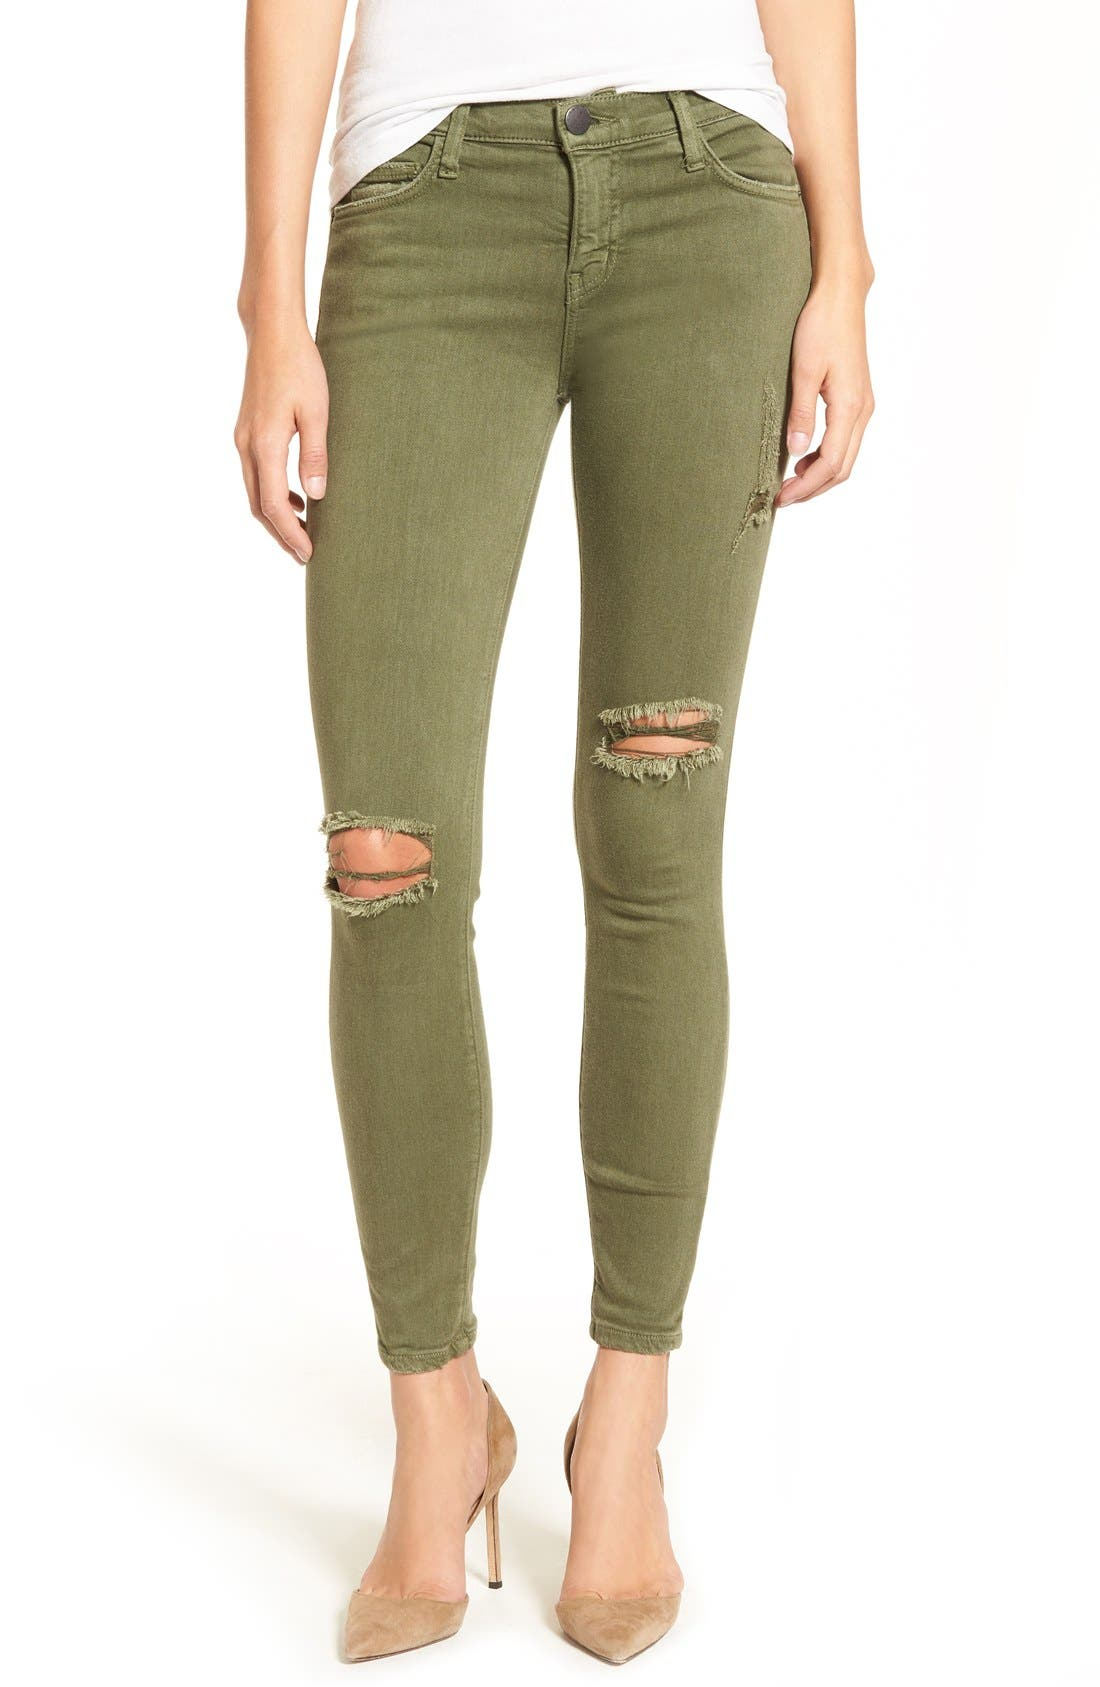 Main Image - Current/Elliott 'The Stiletto' Crop Skinny Jeans